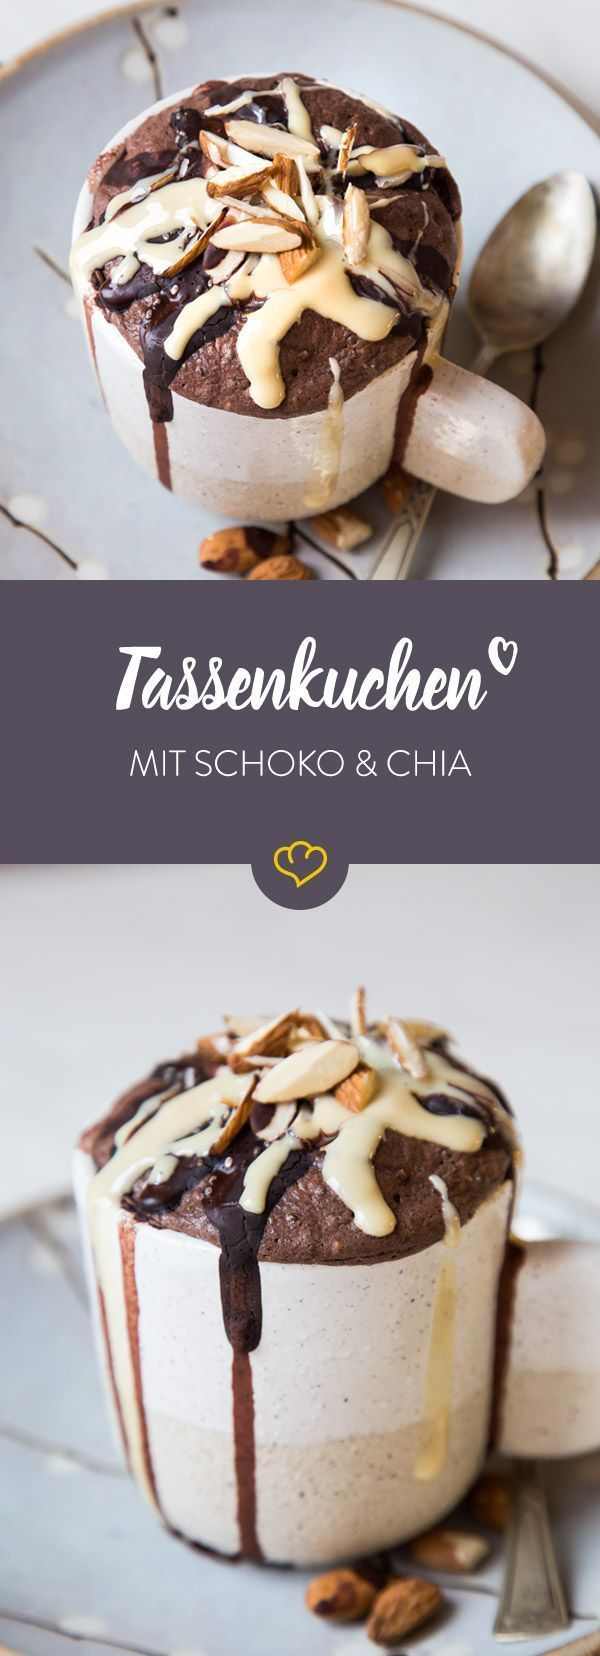 Chia-Schoko-Tassenkuchen mit Mandelmus – #ChiaSchokoTassenkuchen #Mandelmus #mit